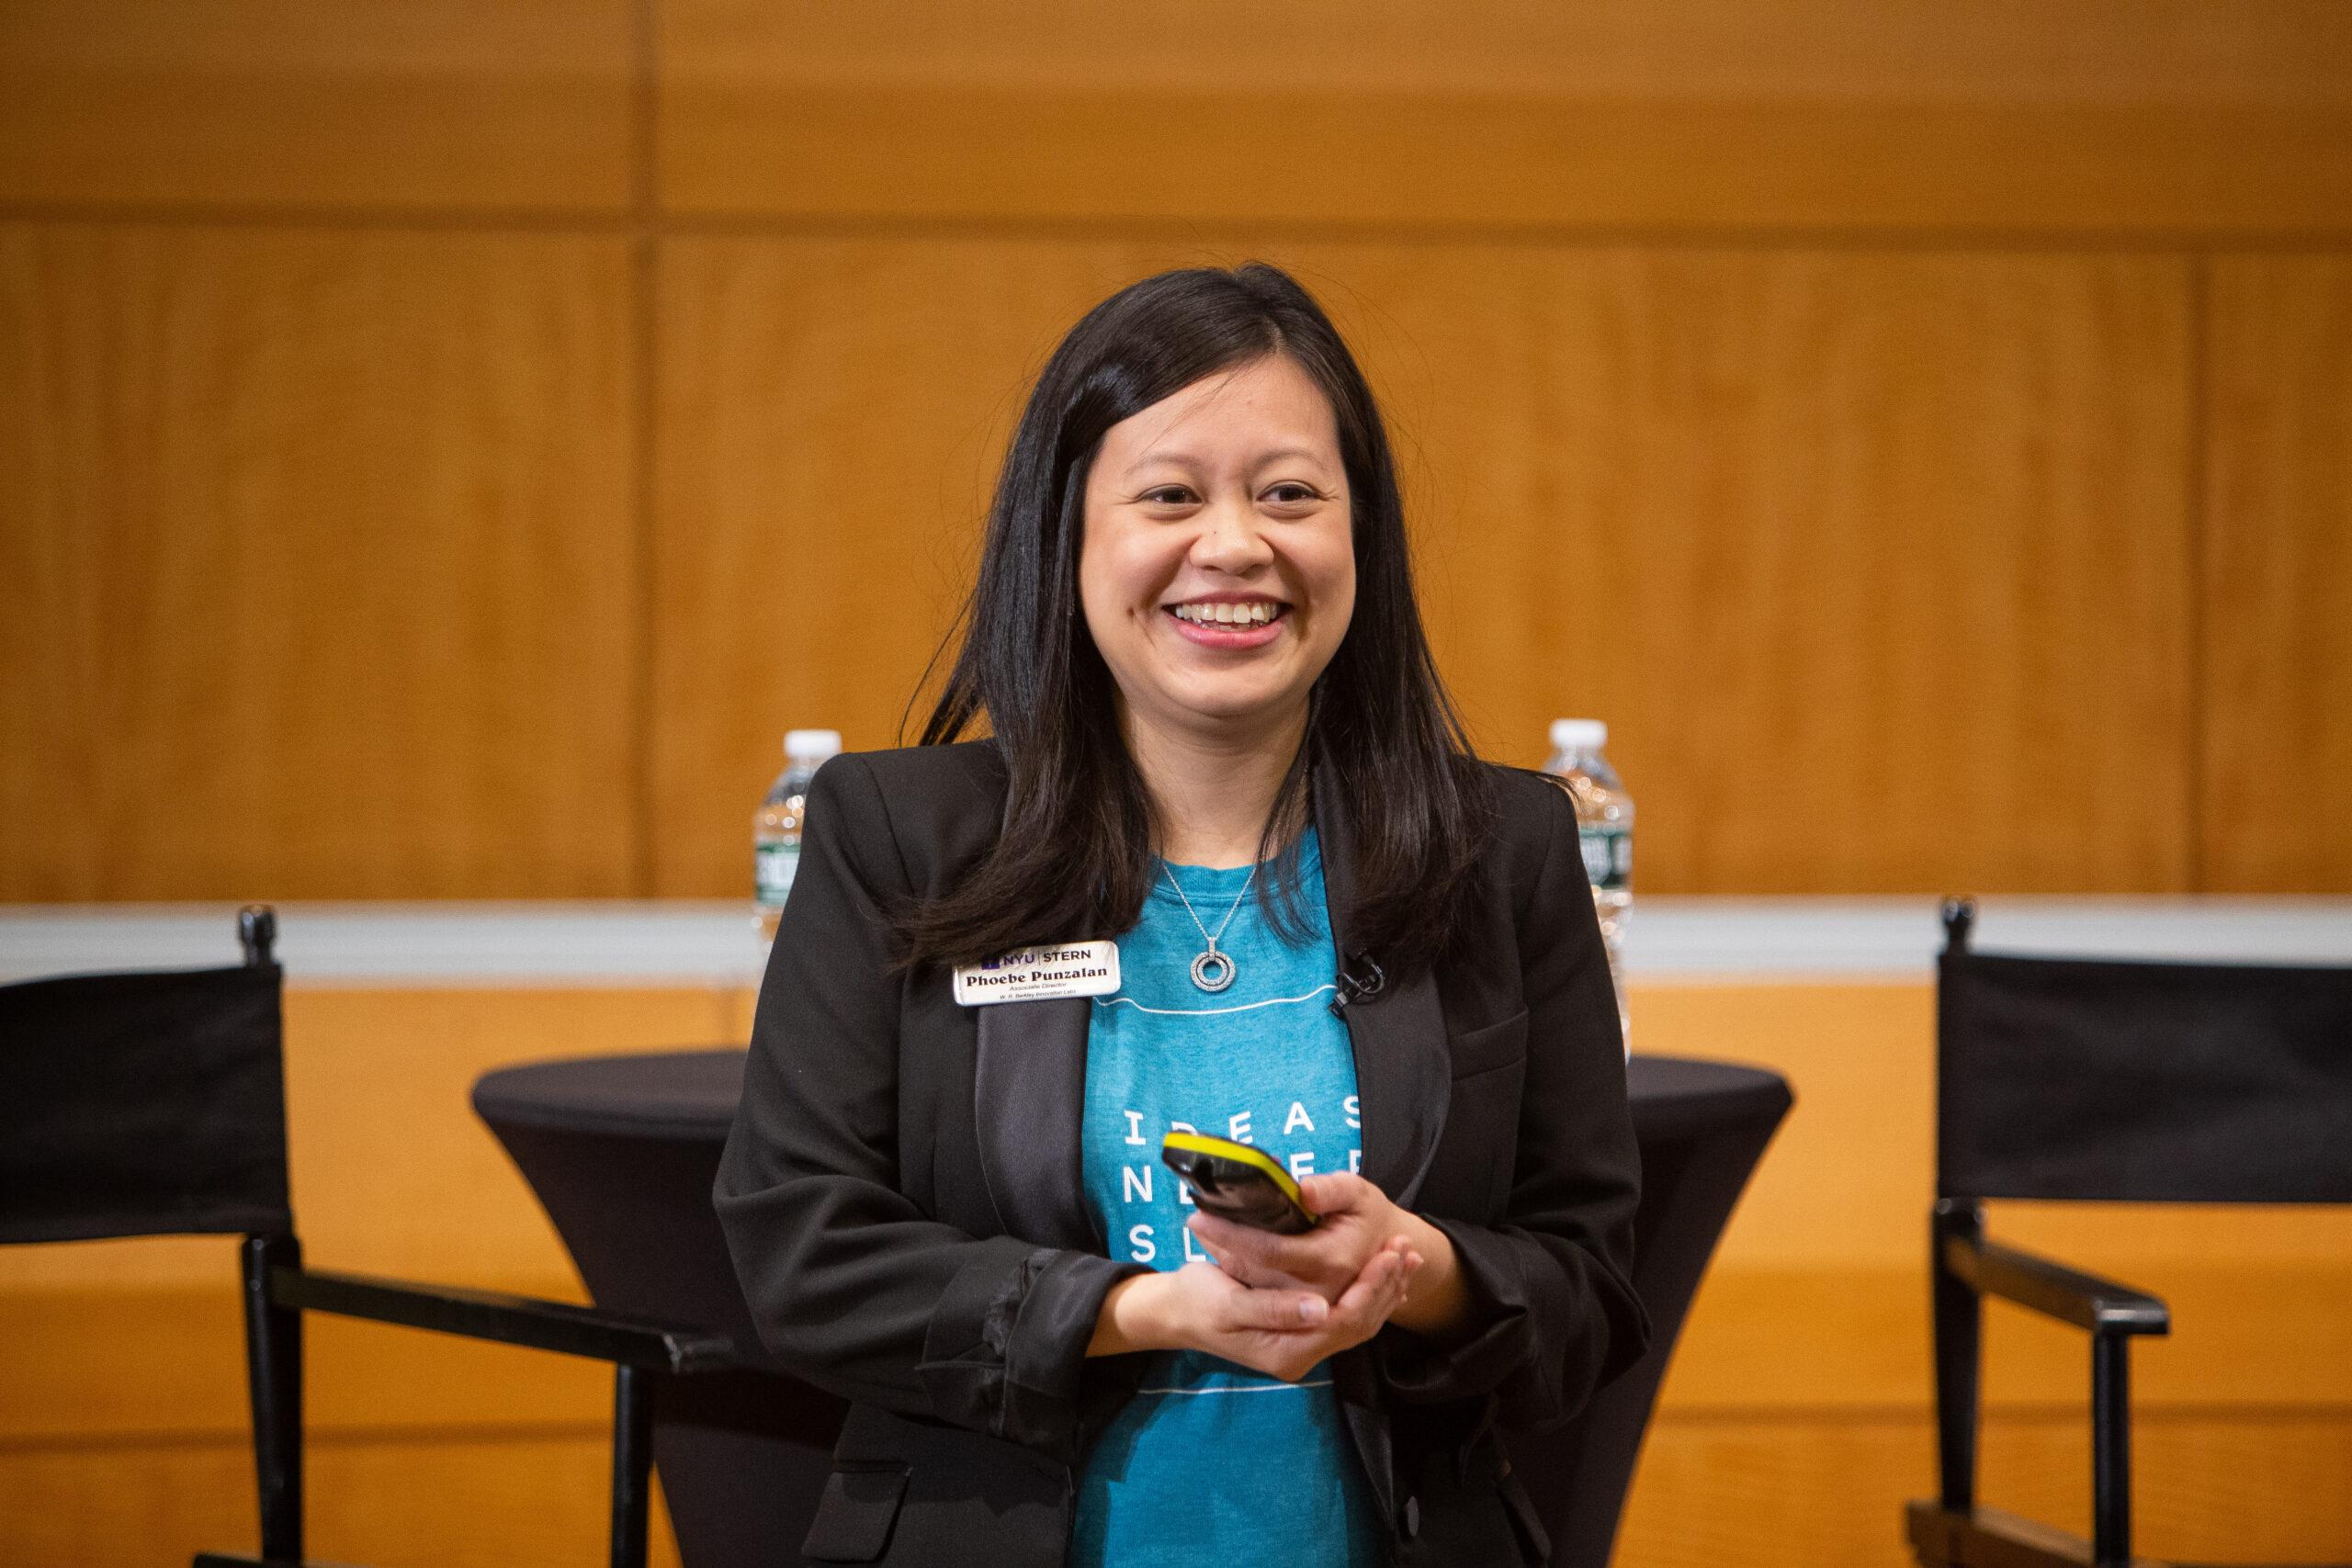 Phoebe Punzalan, Associate Director, presenting